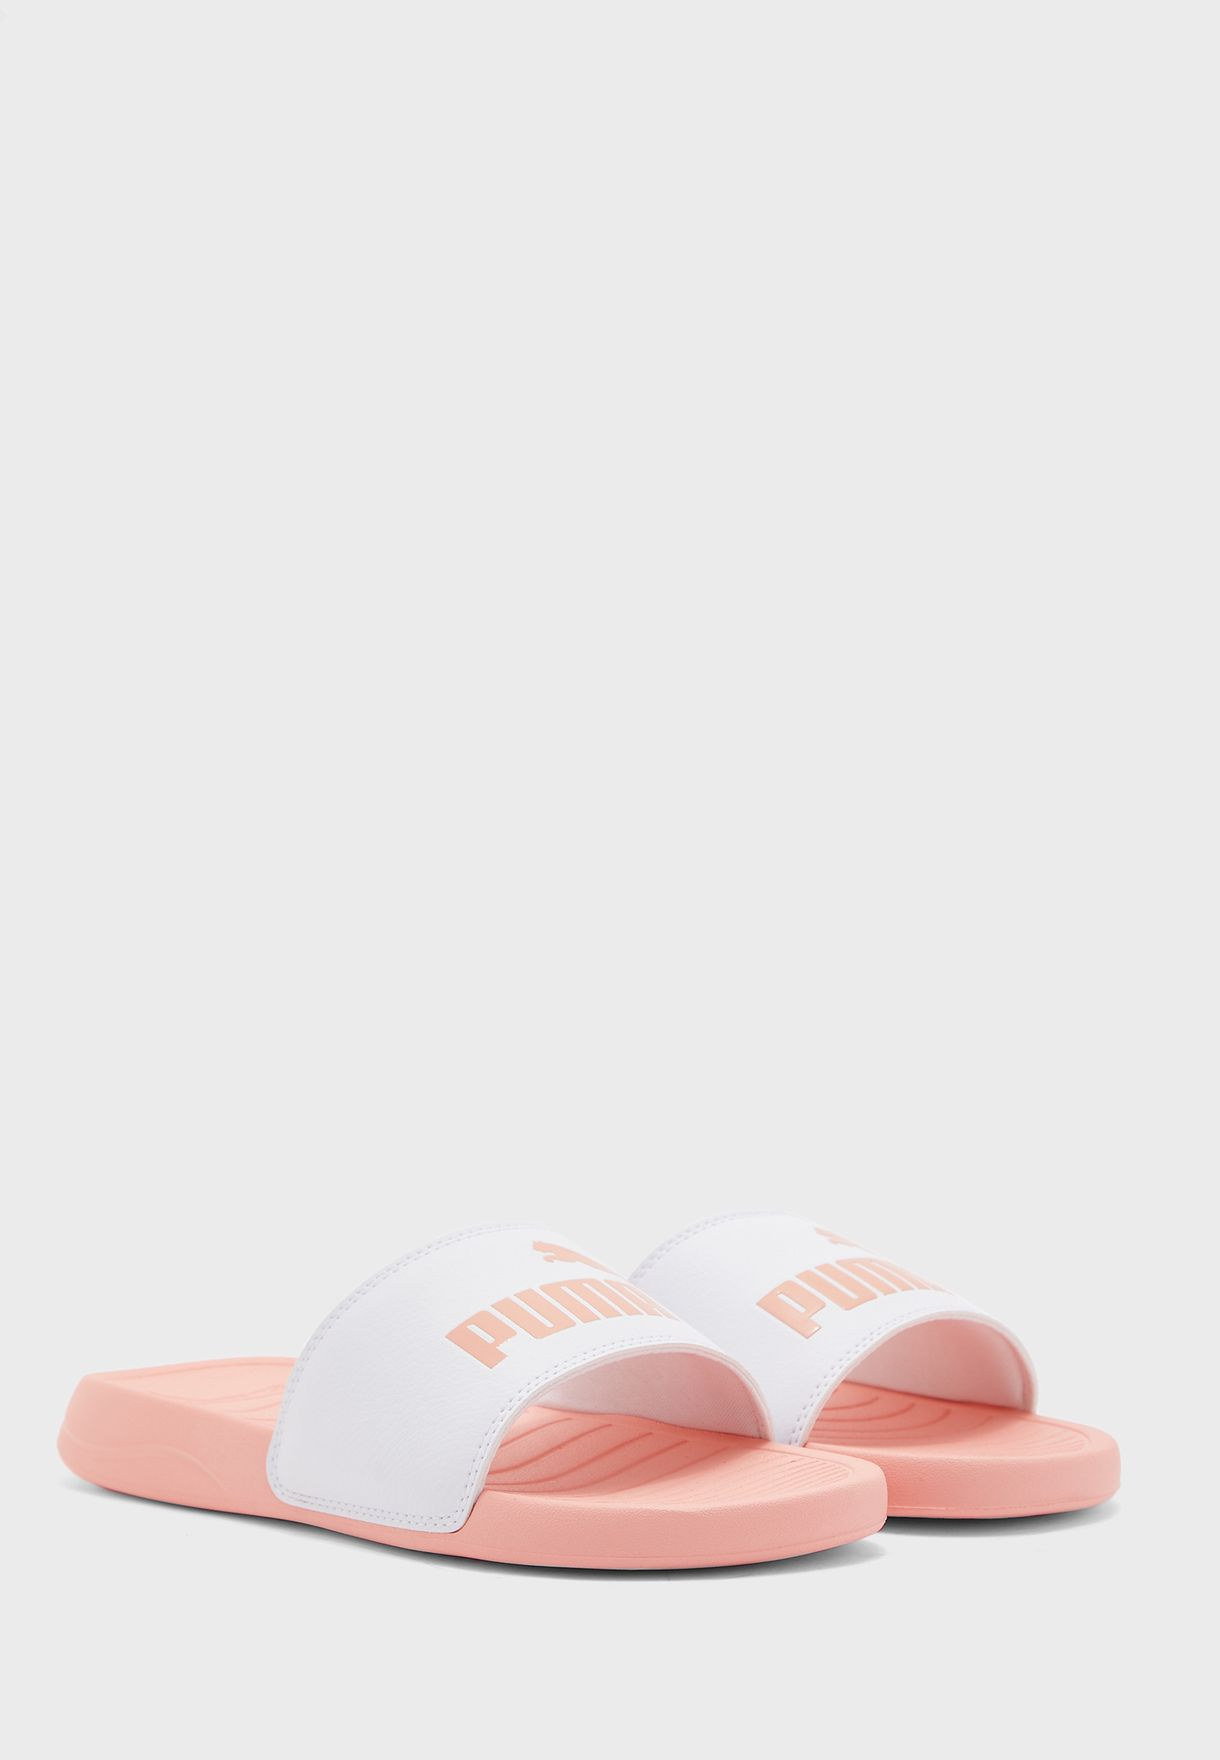 Popcat 20 men sandals